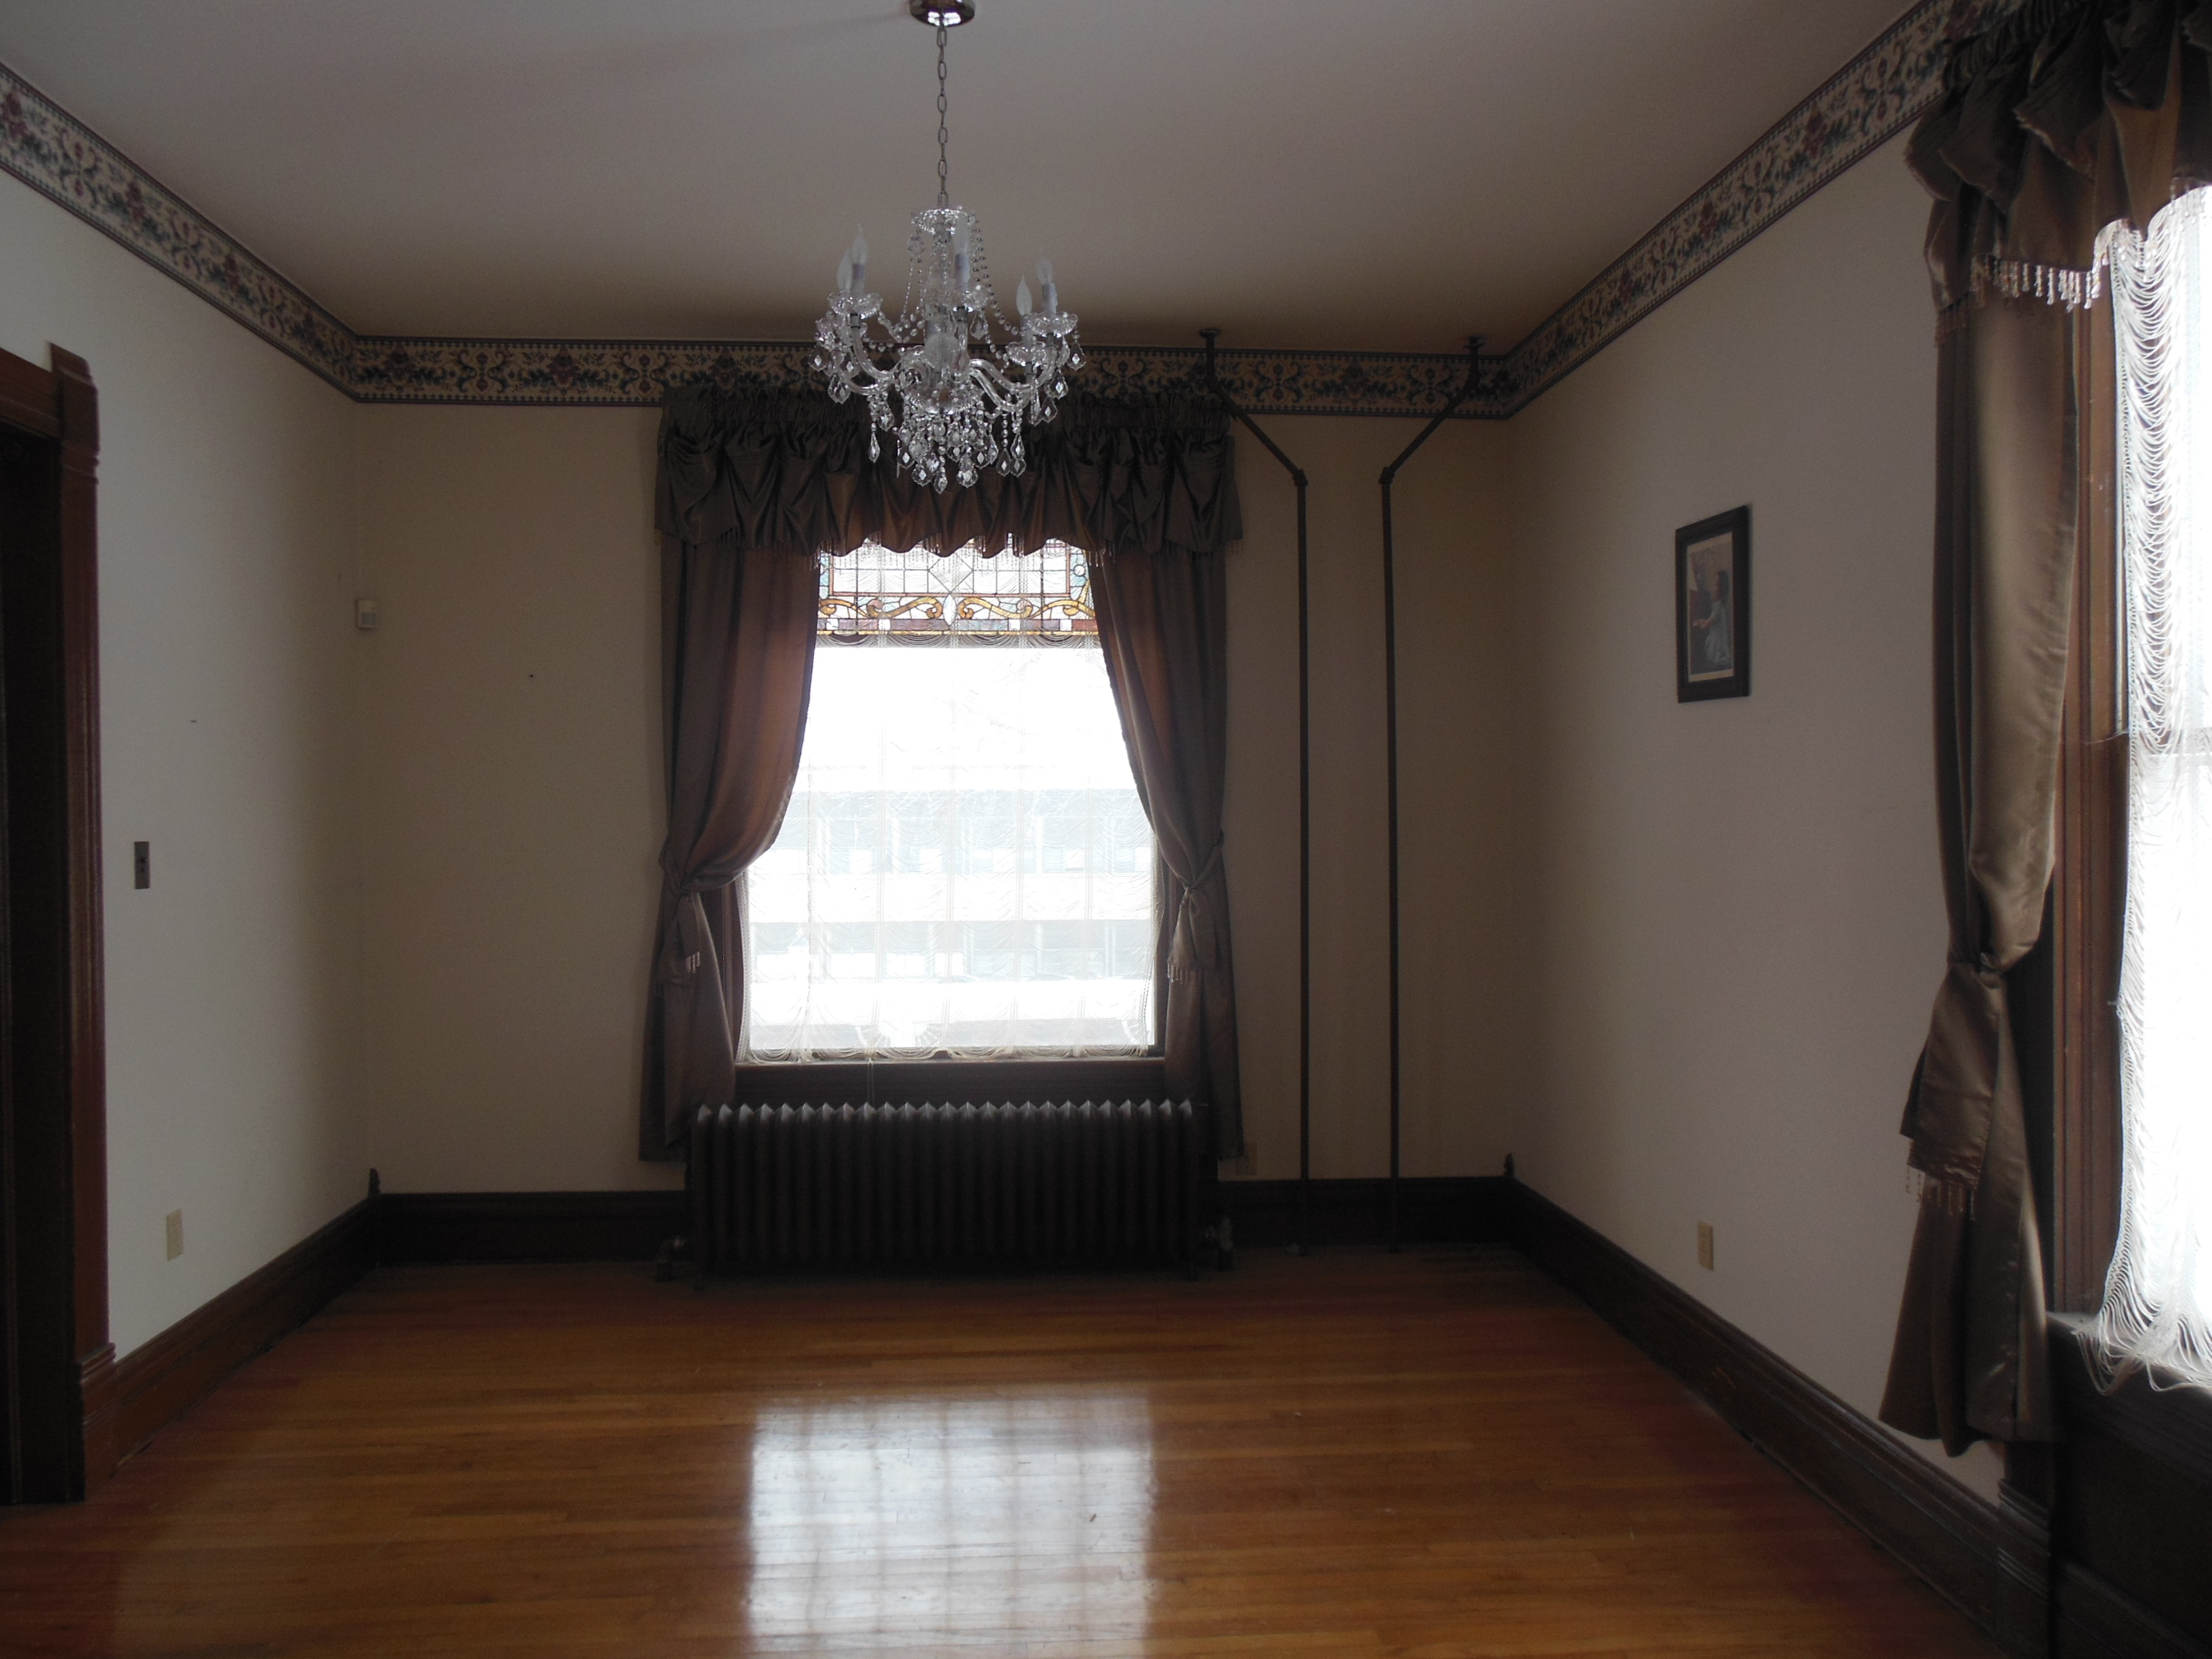 509 Normal Interior rooms